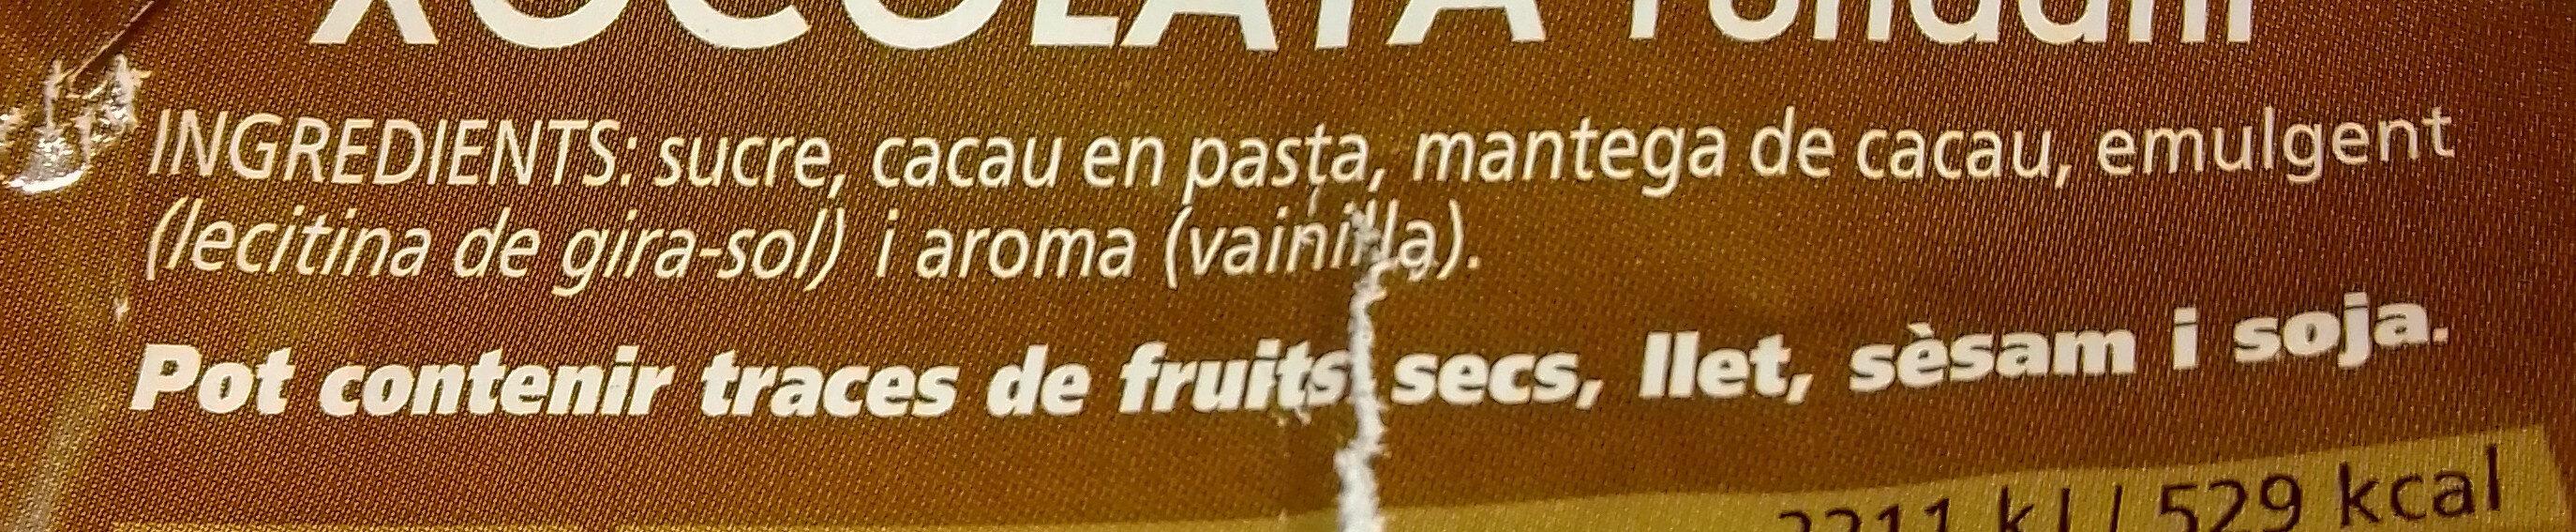 Chocolate fondant 48% - Ingredients - ca